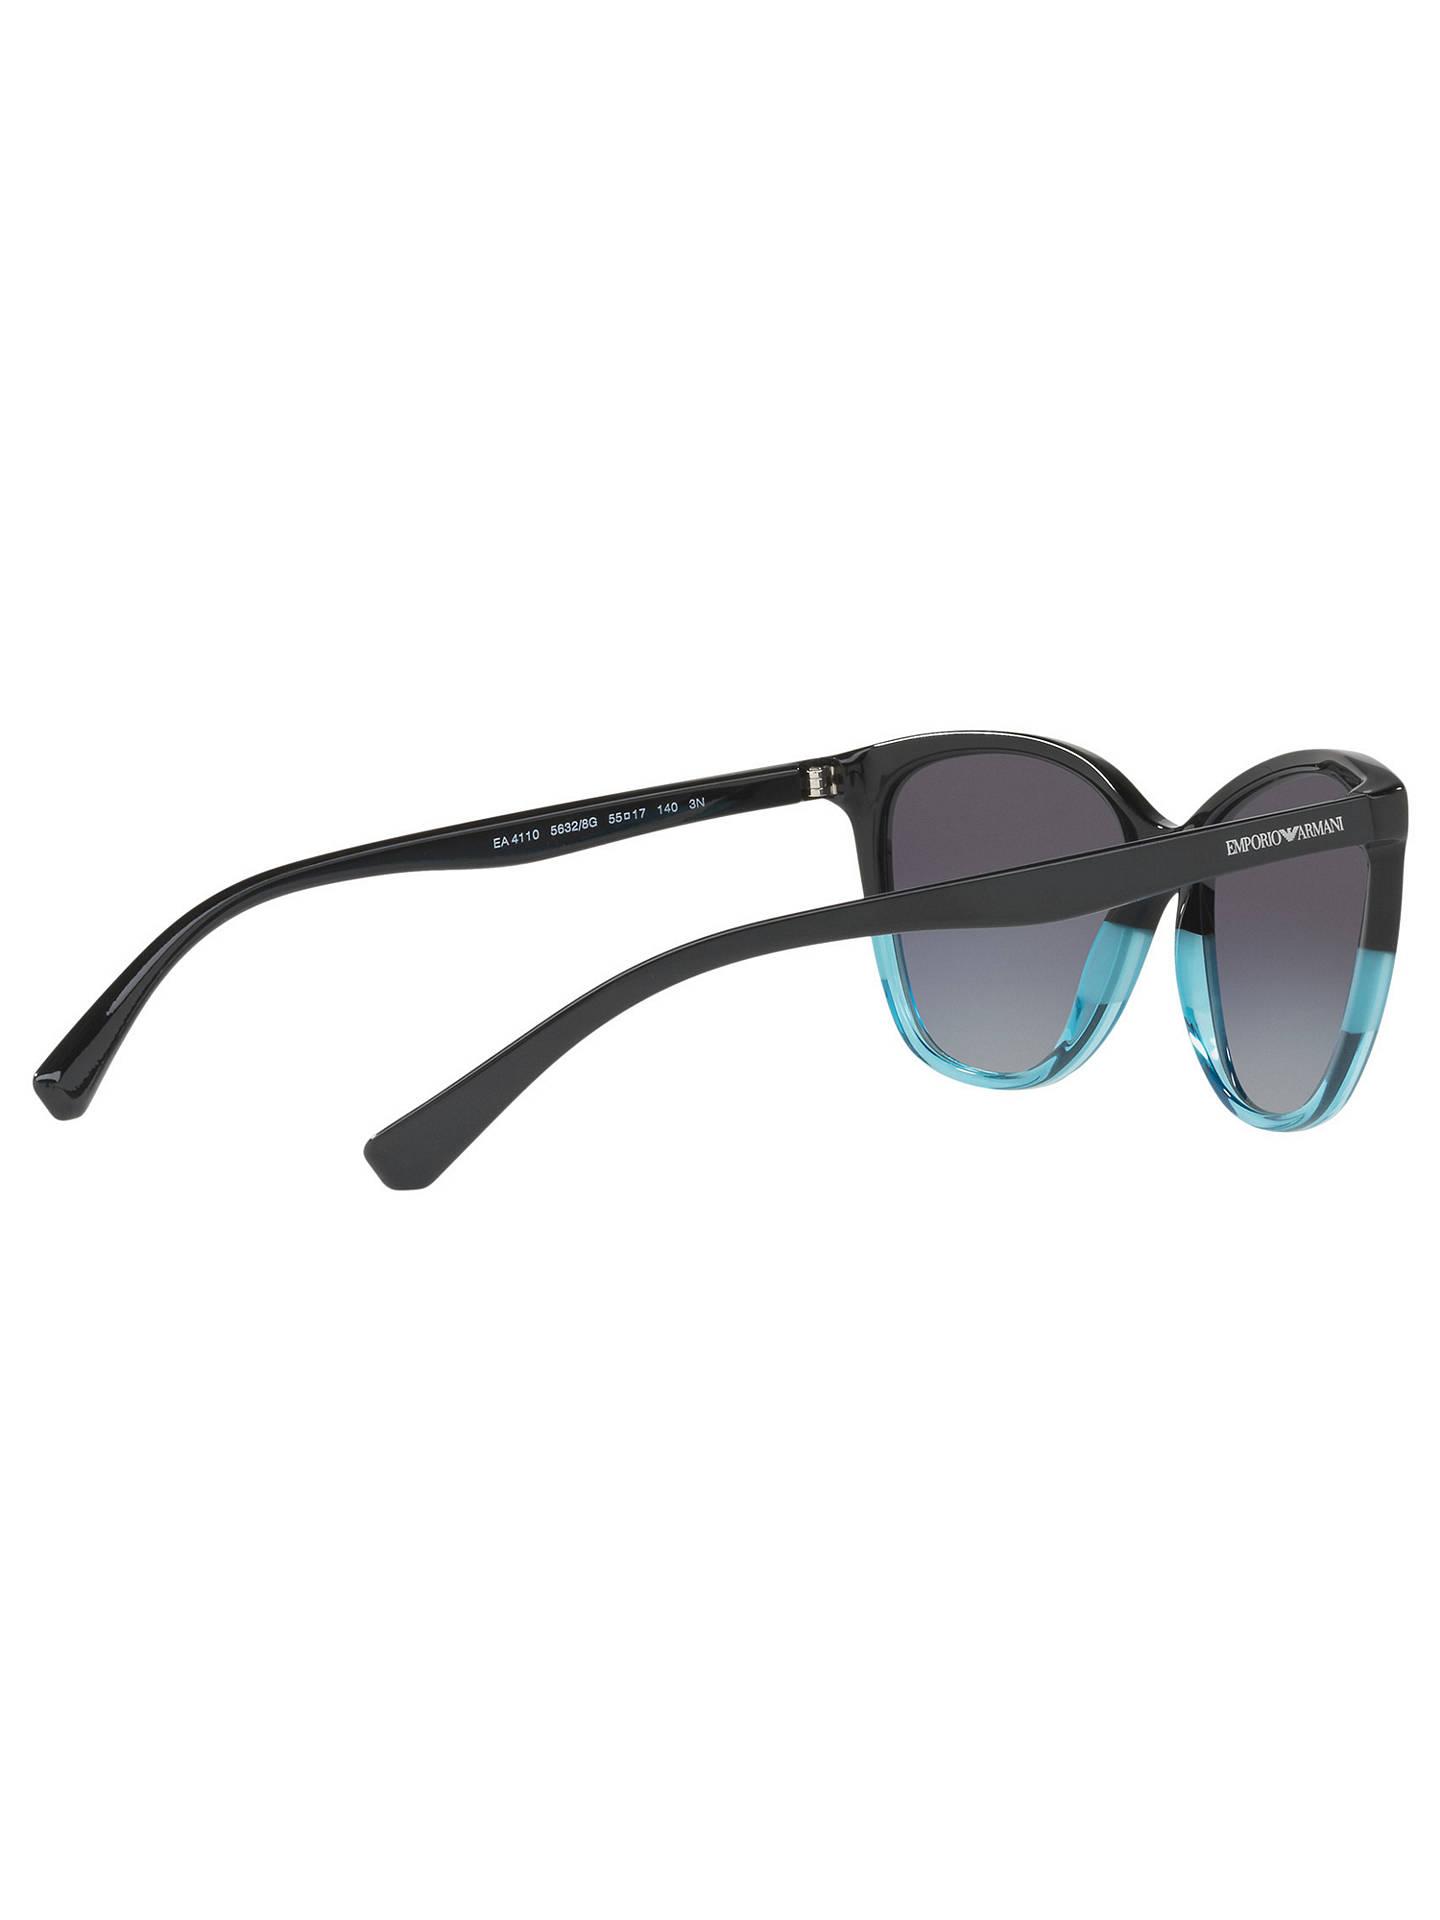 e30929b17979 Emporio Armani EA4110 Cat s Eye Sunglasses at John Lewis   Partners